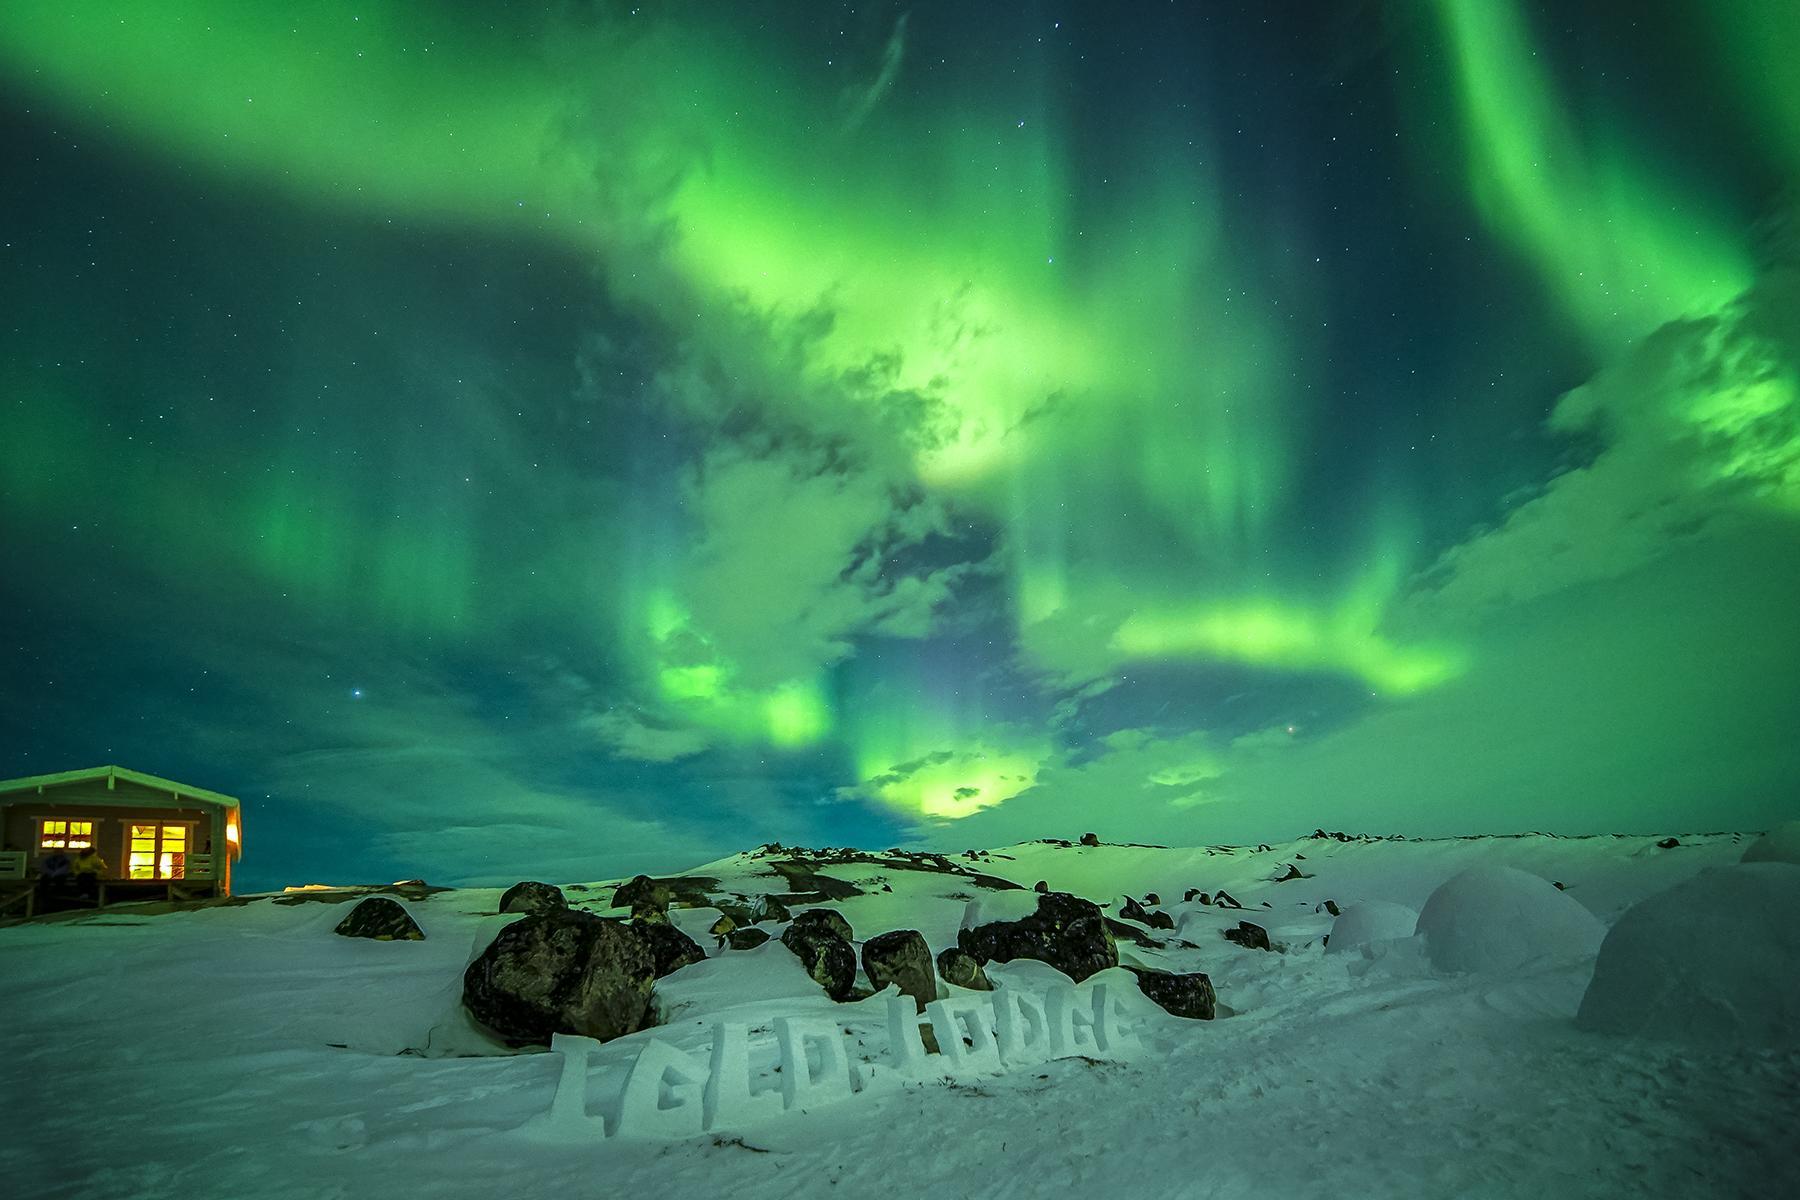 11_AdevnturousBabymoons__TheNorthernLightsinGreenland_11.) Northern lights dancing over the Igloo Lodge near Ilulissat provided by World of Greenland